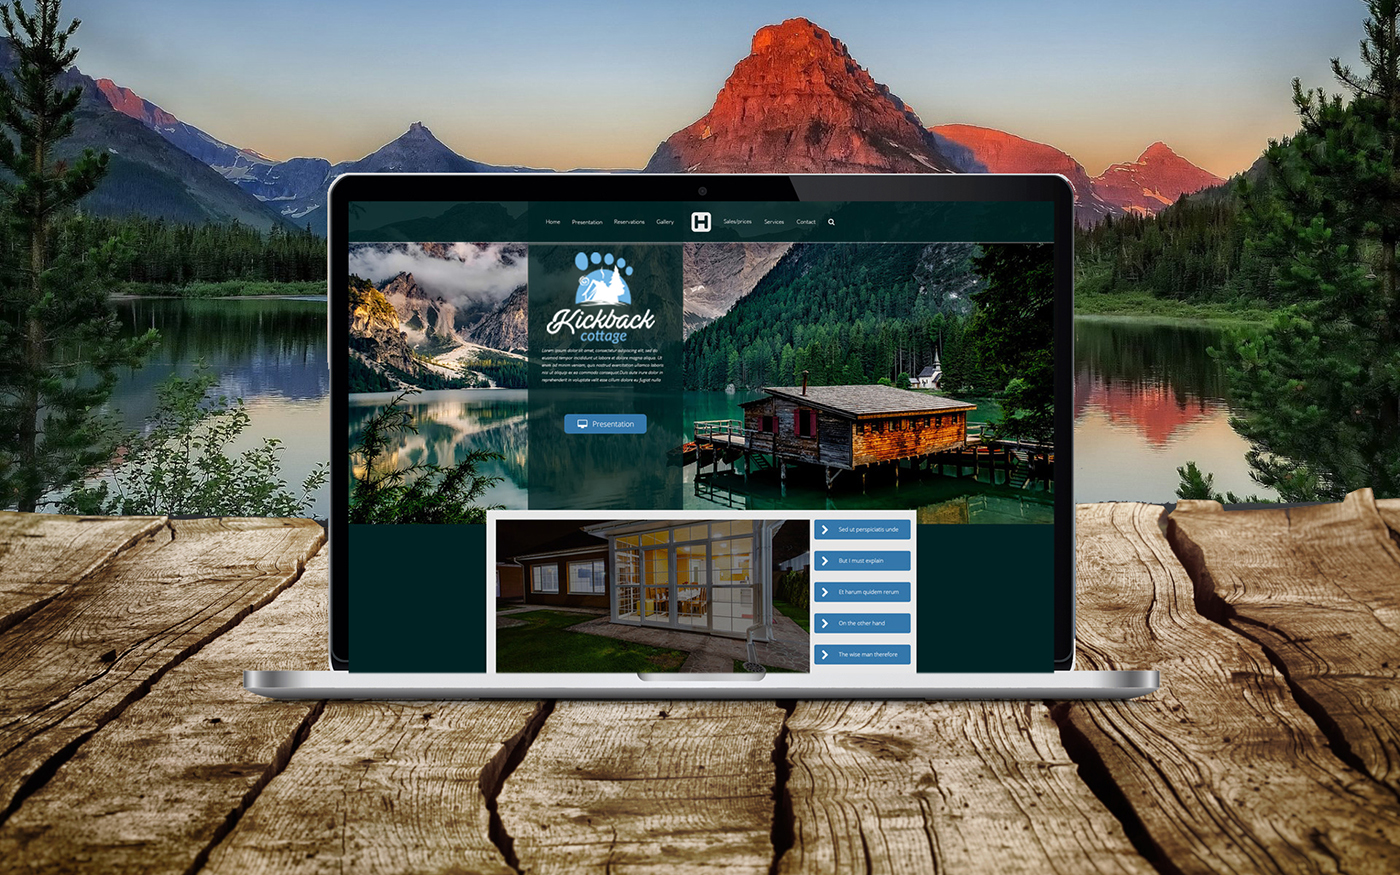 Kickback Cottage Custom Vacation Rental Website Design